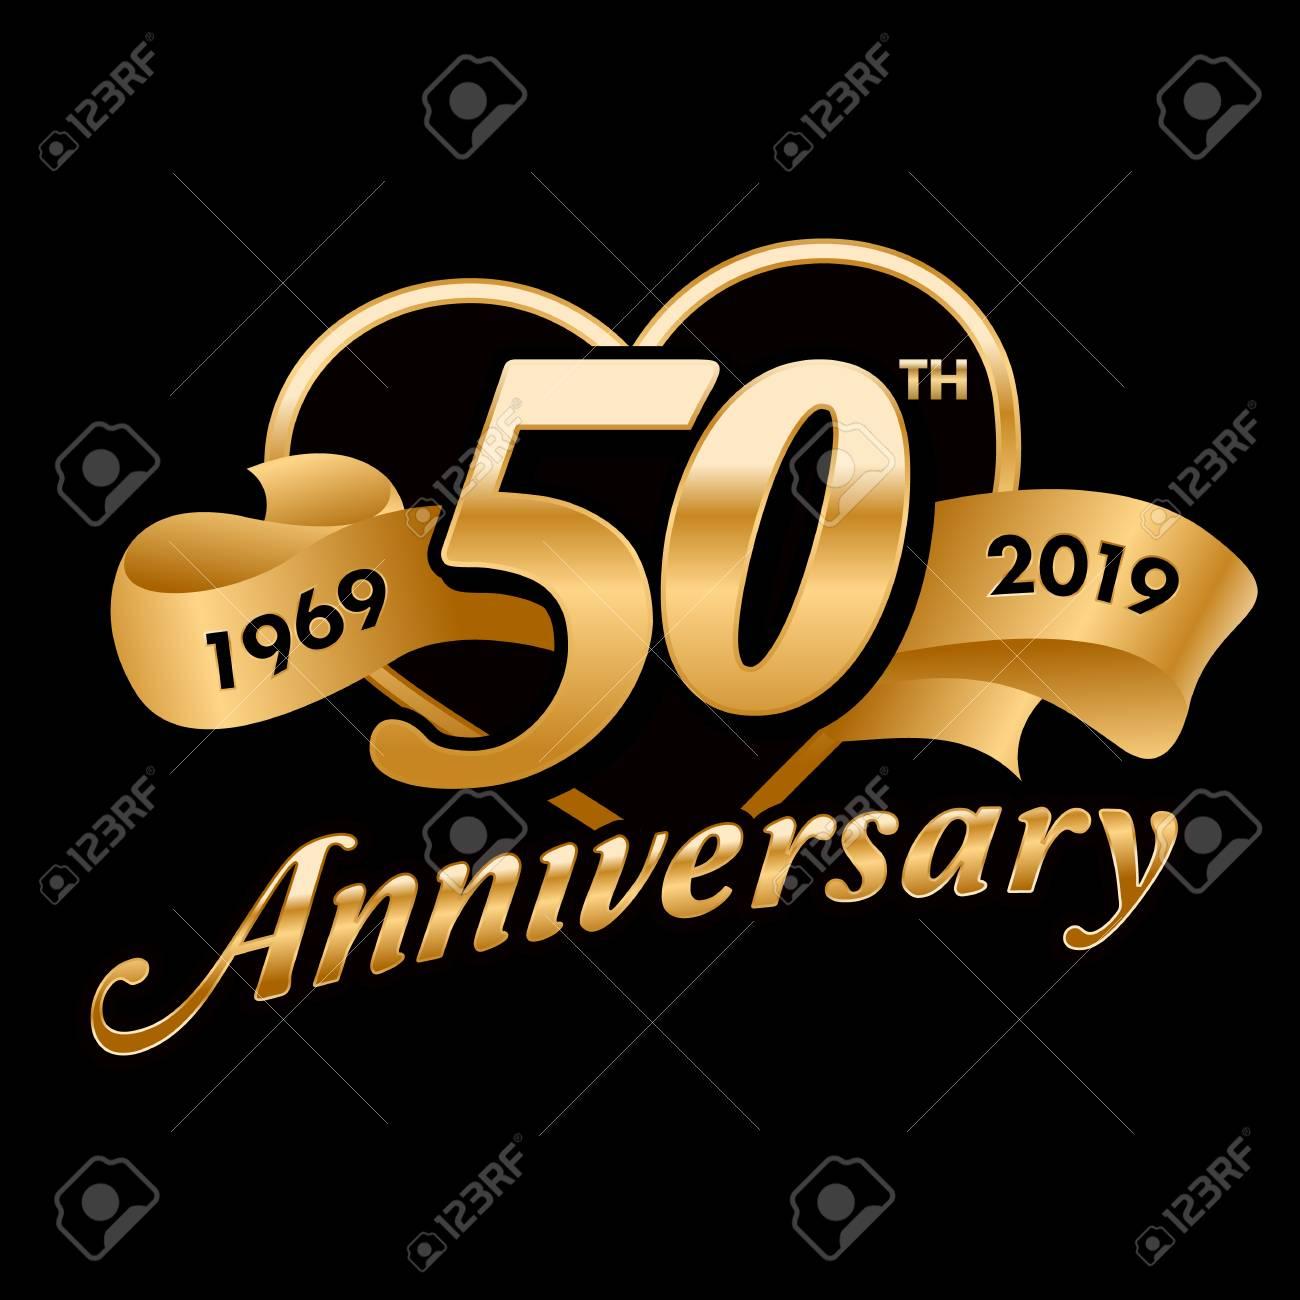 50th Anniversary Celebration - 121759302